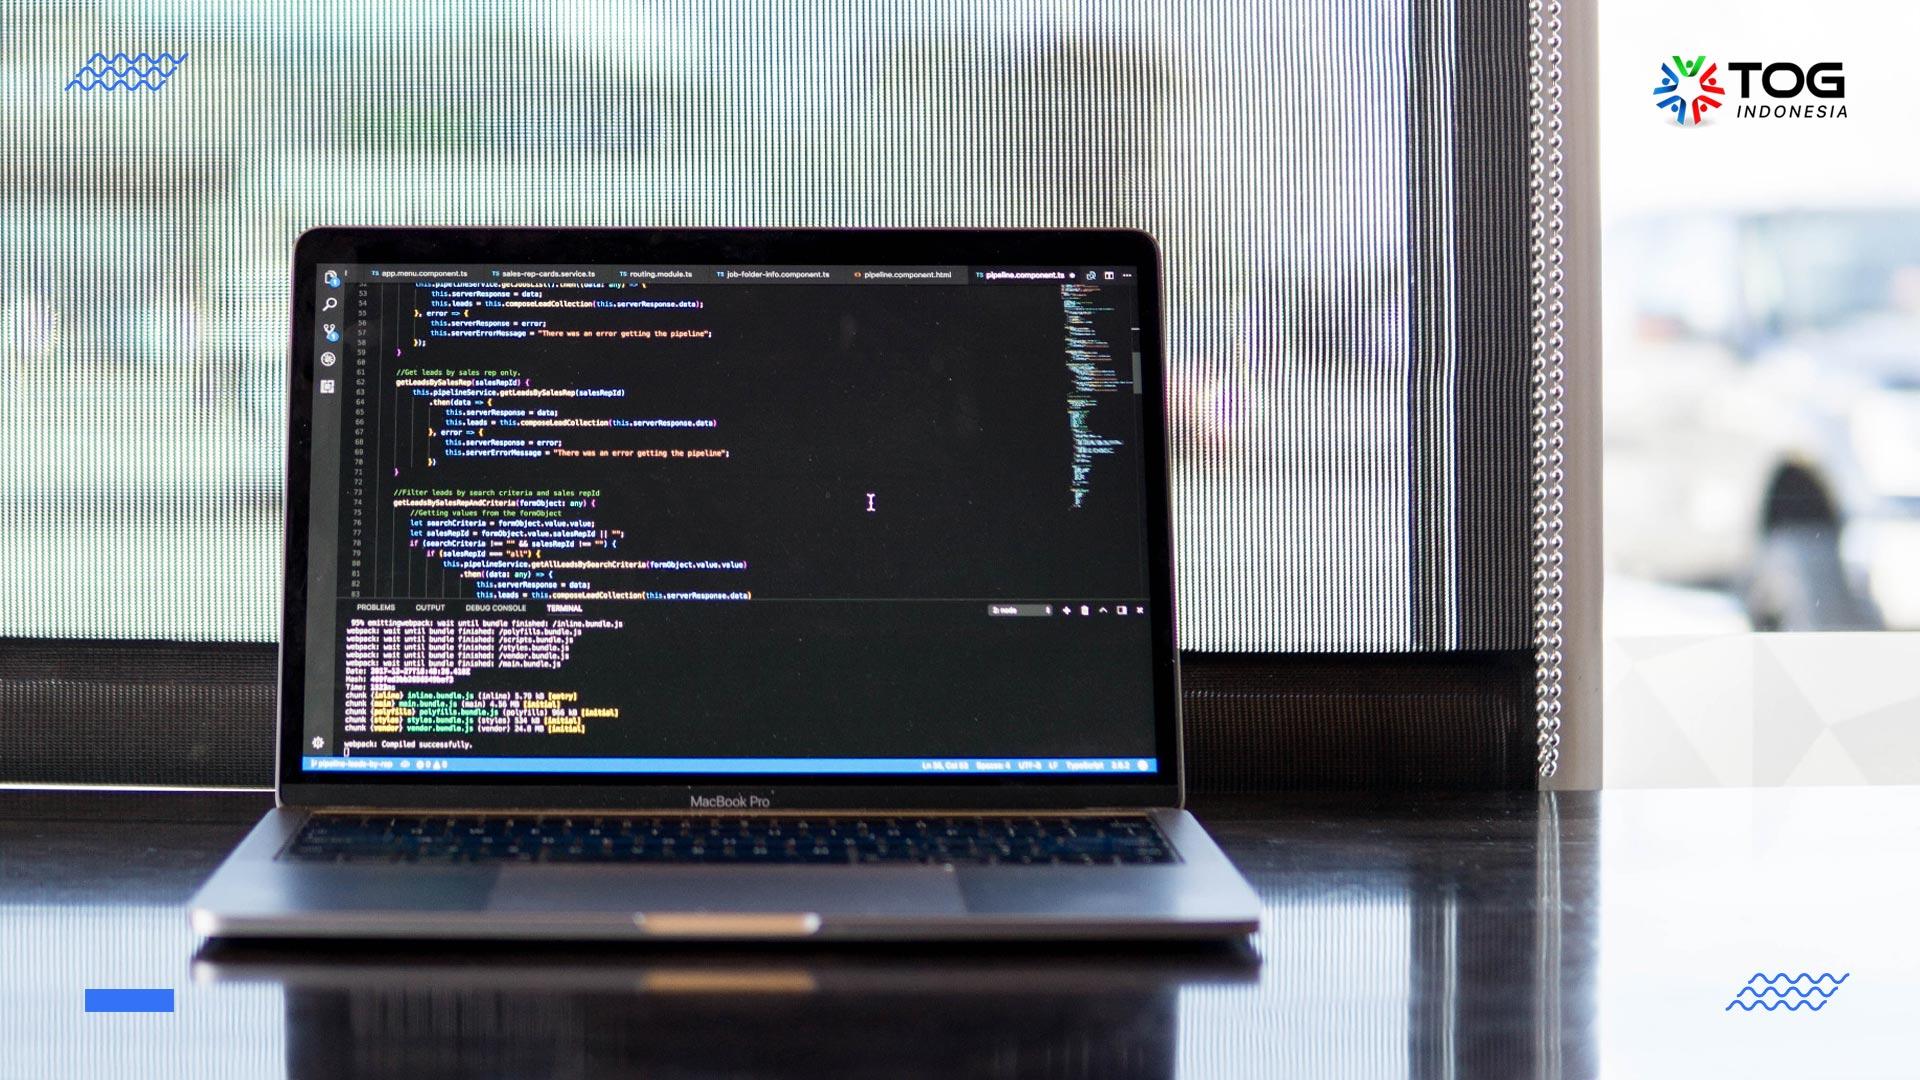 Mengenal Bahasa Pemrograman C++ yang Hasilkan Gaji Tinggi